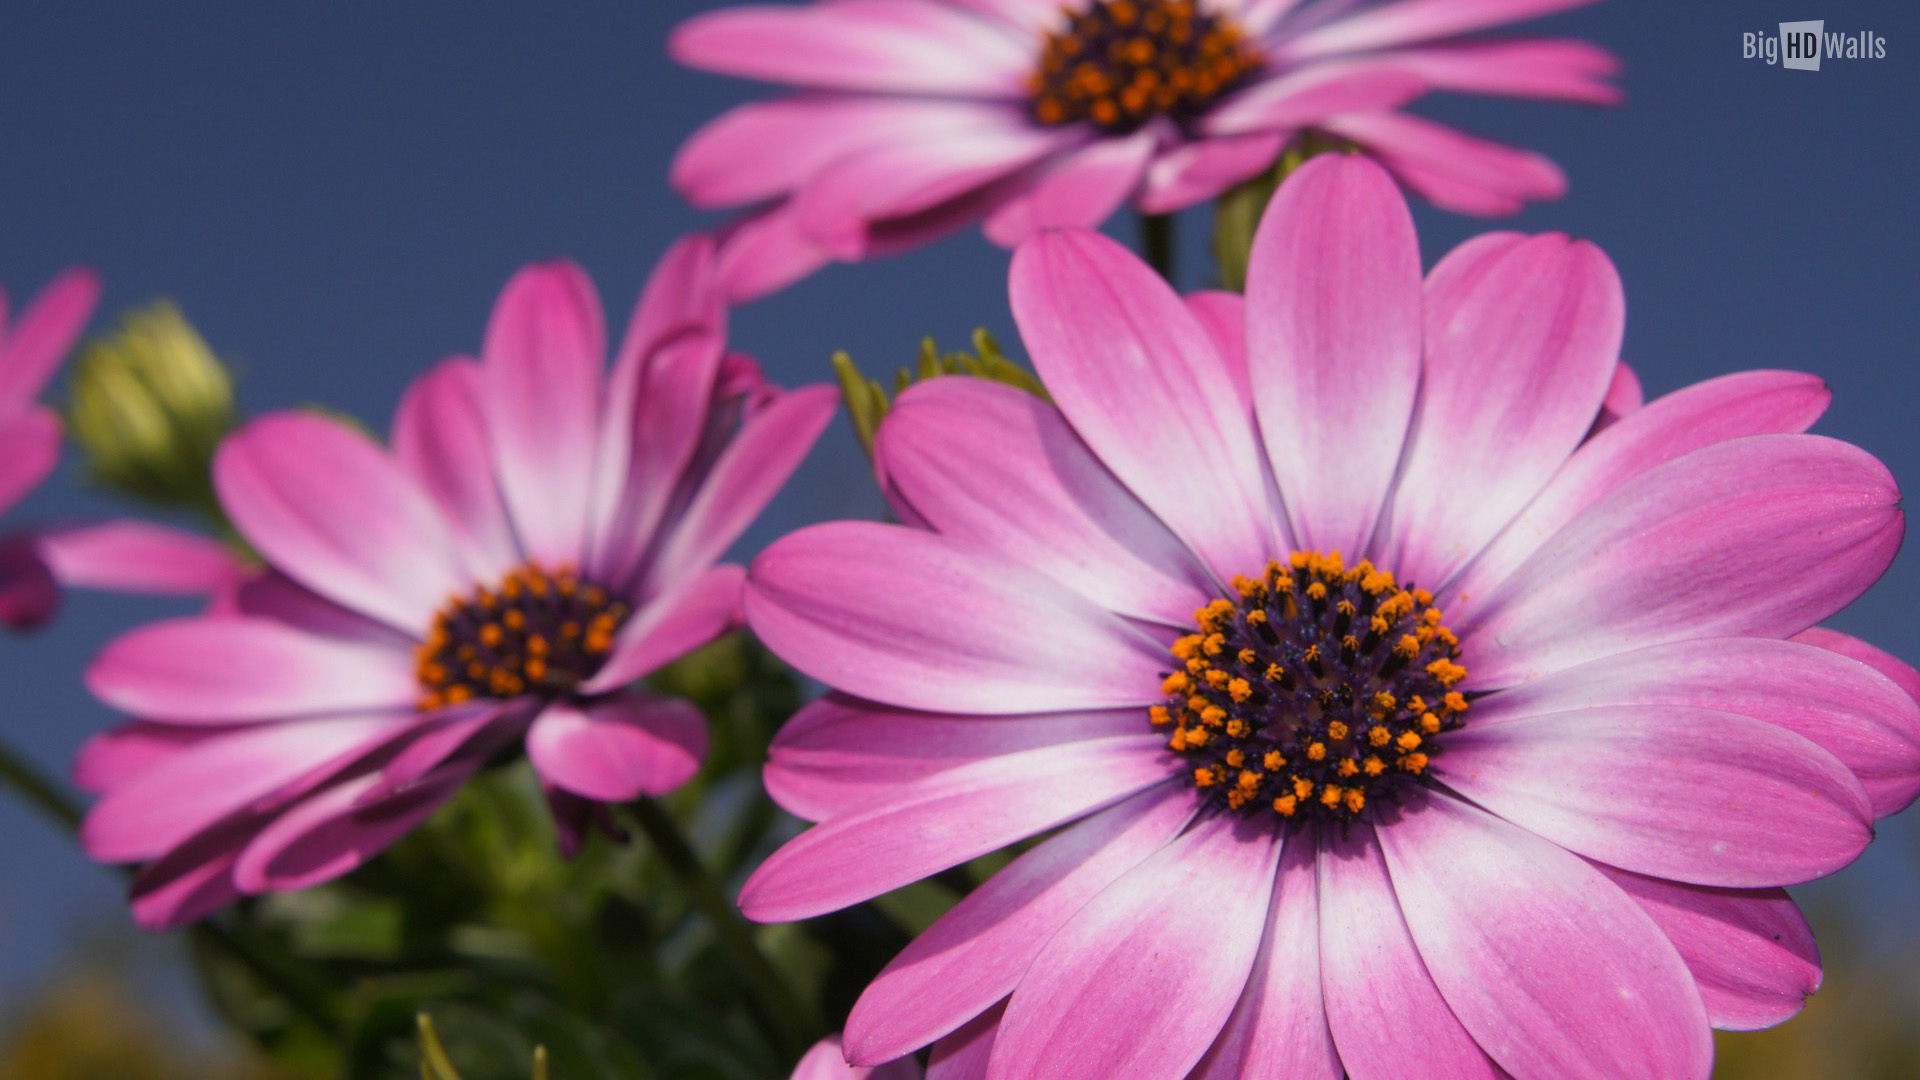 pink spring flowers HD Wallpaper006 1920x1080